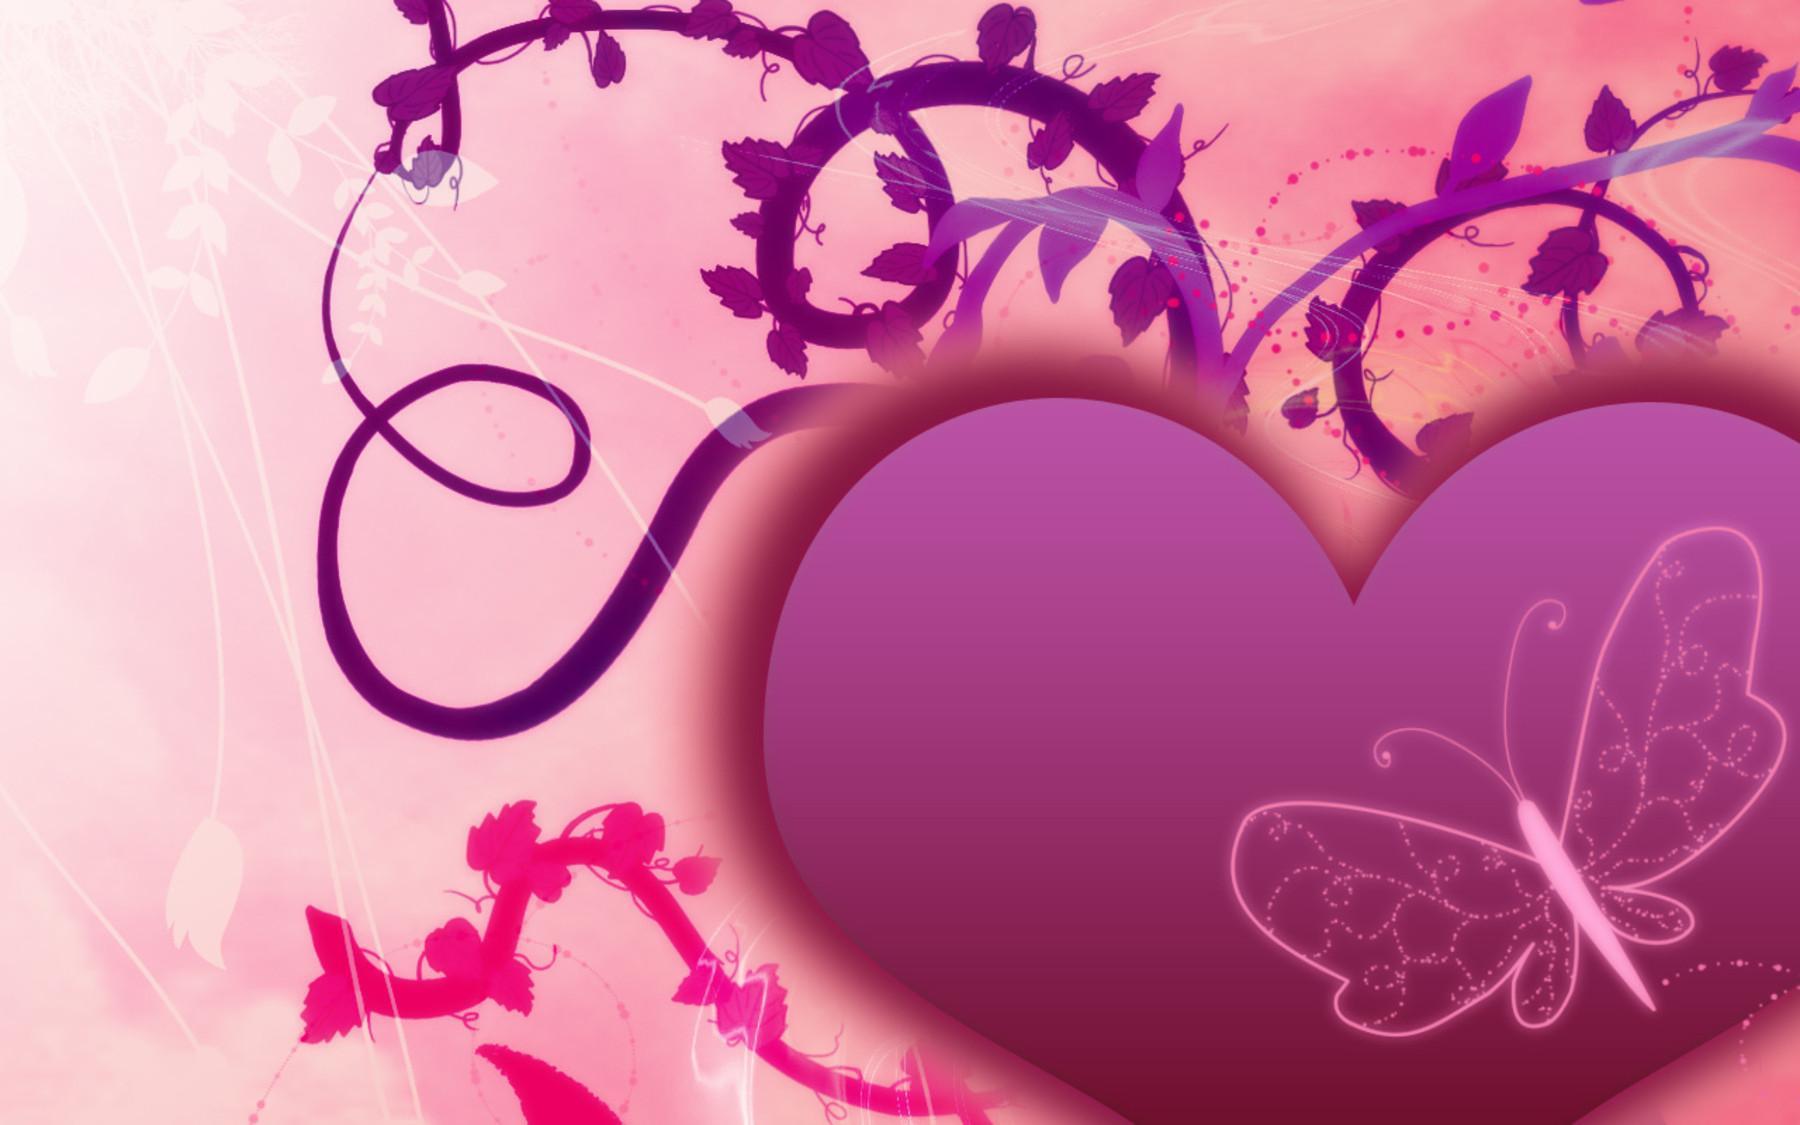 Love Wallpaper Download 1800x1125